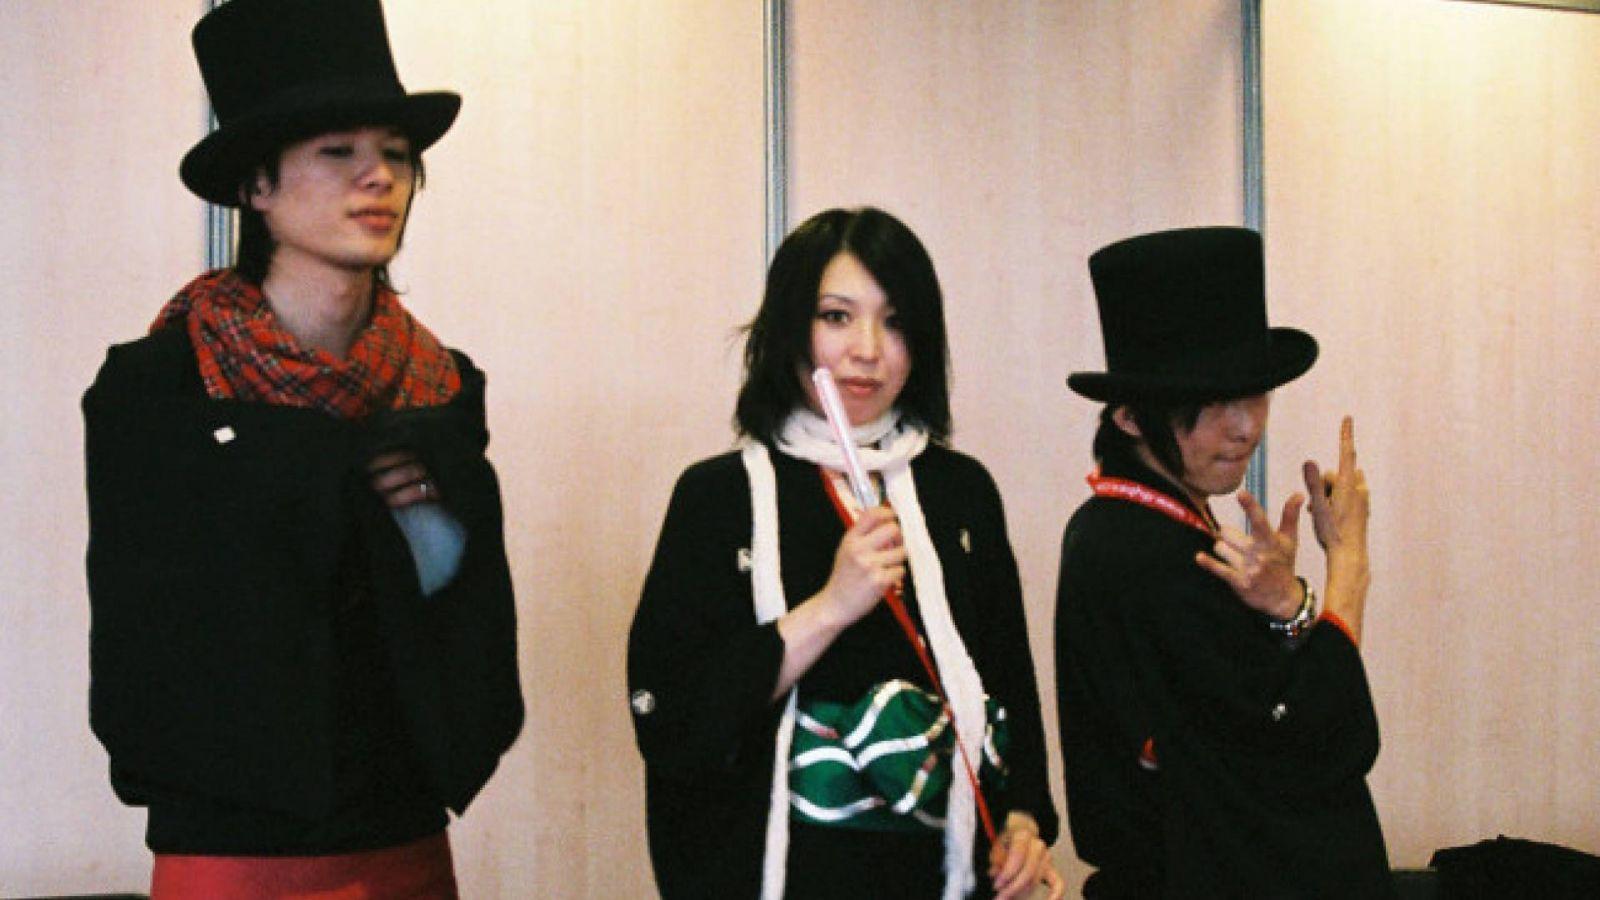 Konferencja prasowa CATSUOMATICDEATH na Japan Expo © CATSUOMATICDEATH  - Aurore - JaME